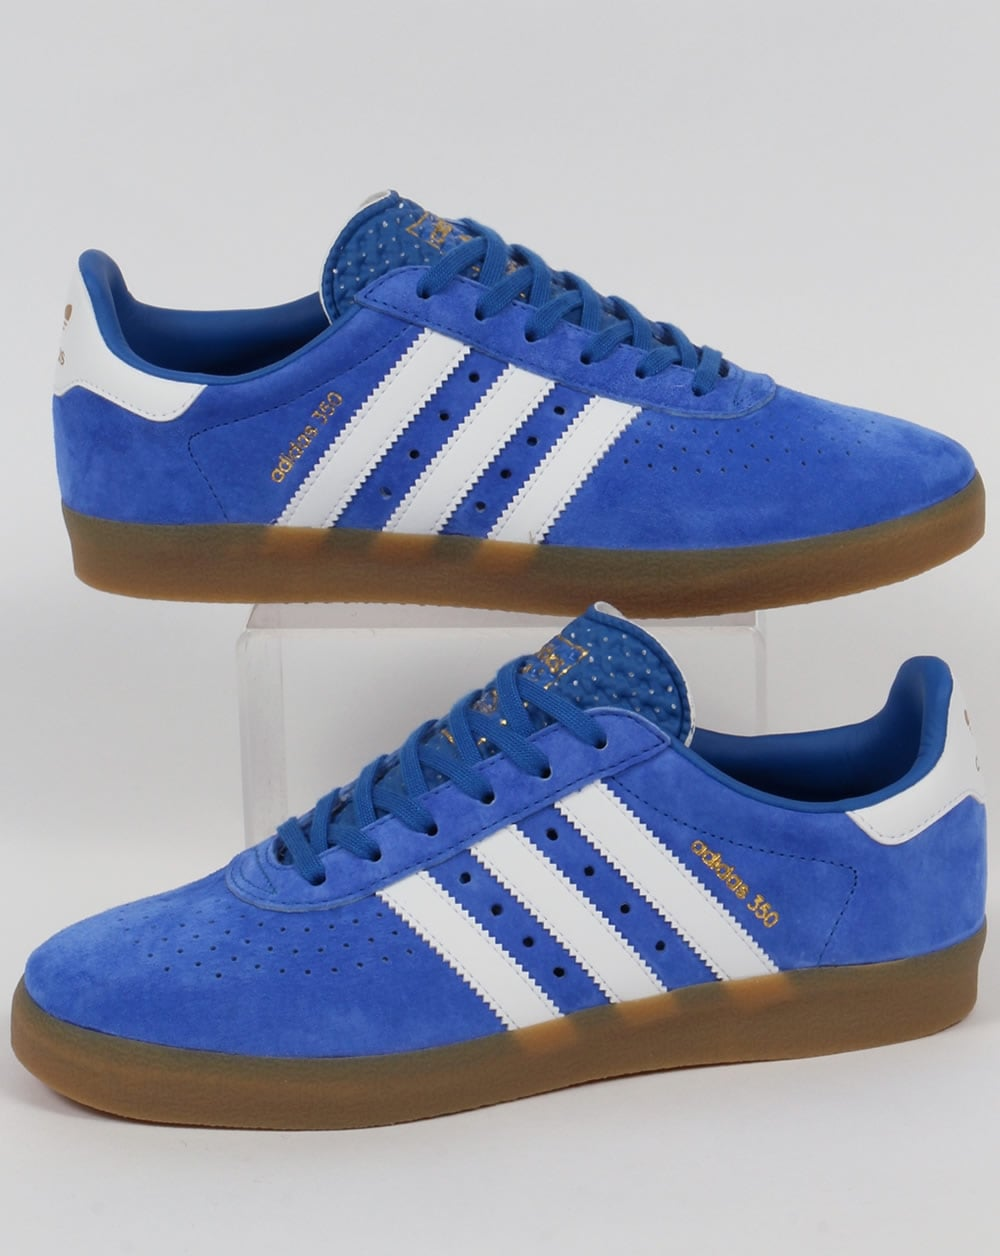 100% authentic a5fb4 e2a25 adidas Trainers Adidas 350 Trainers BlueWhiteGum